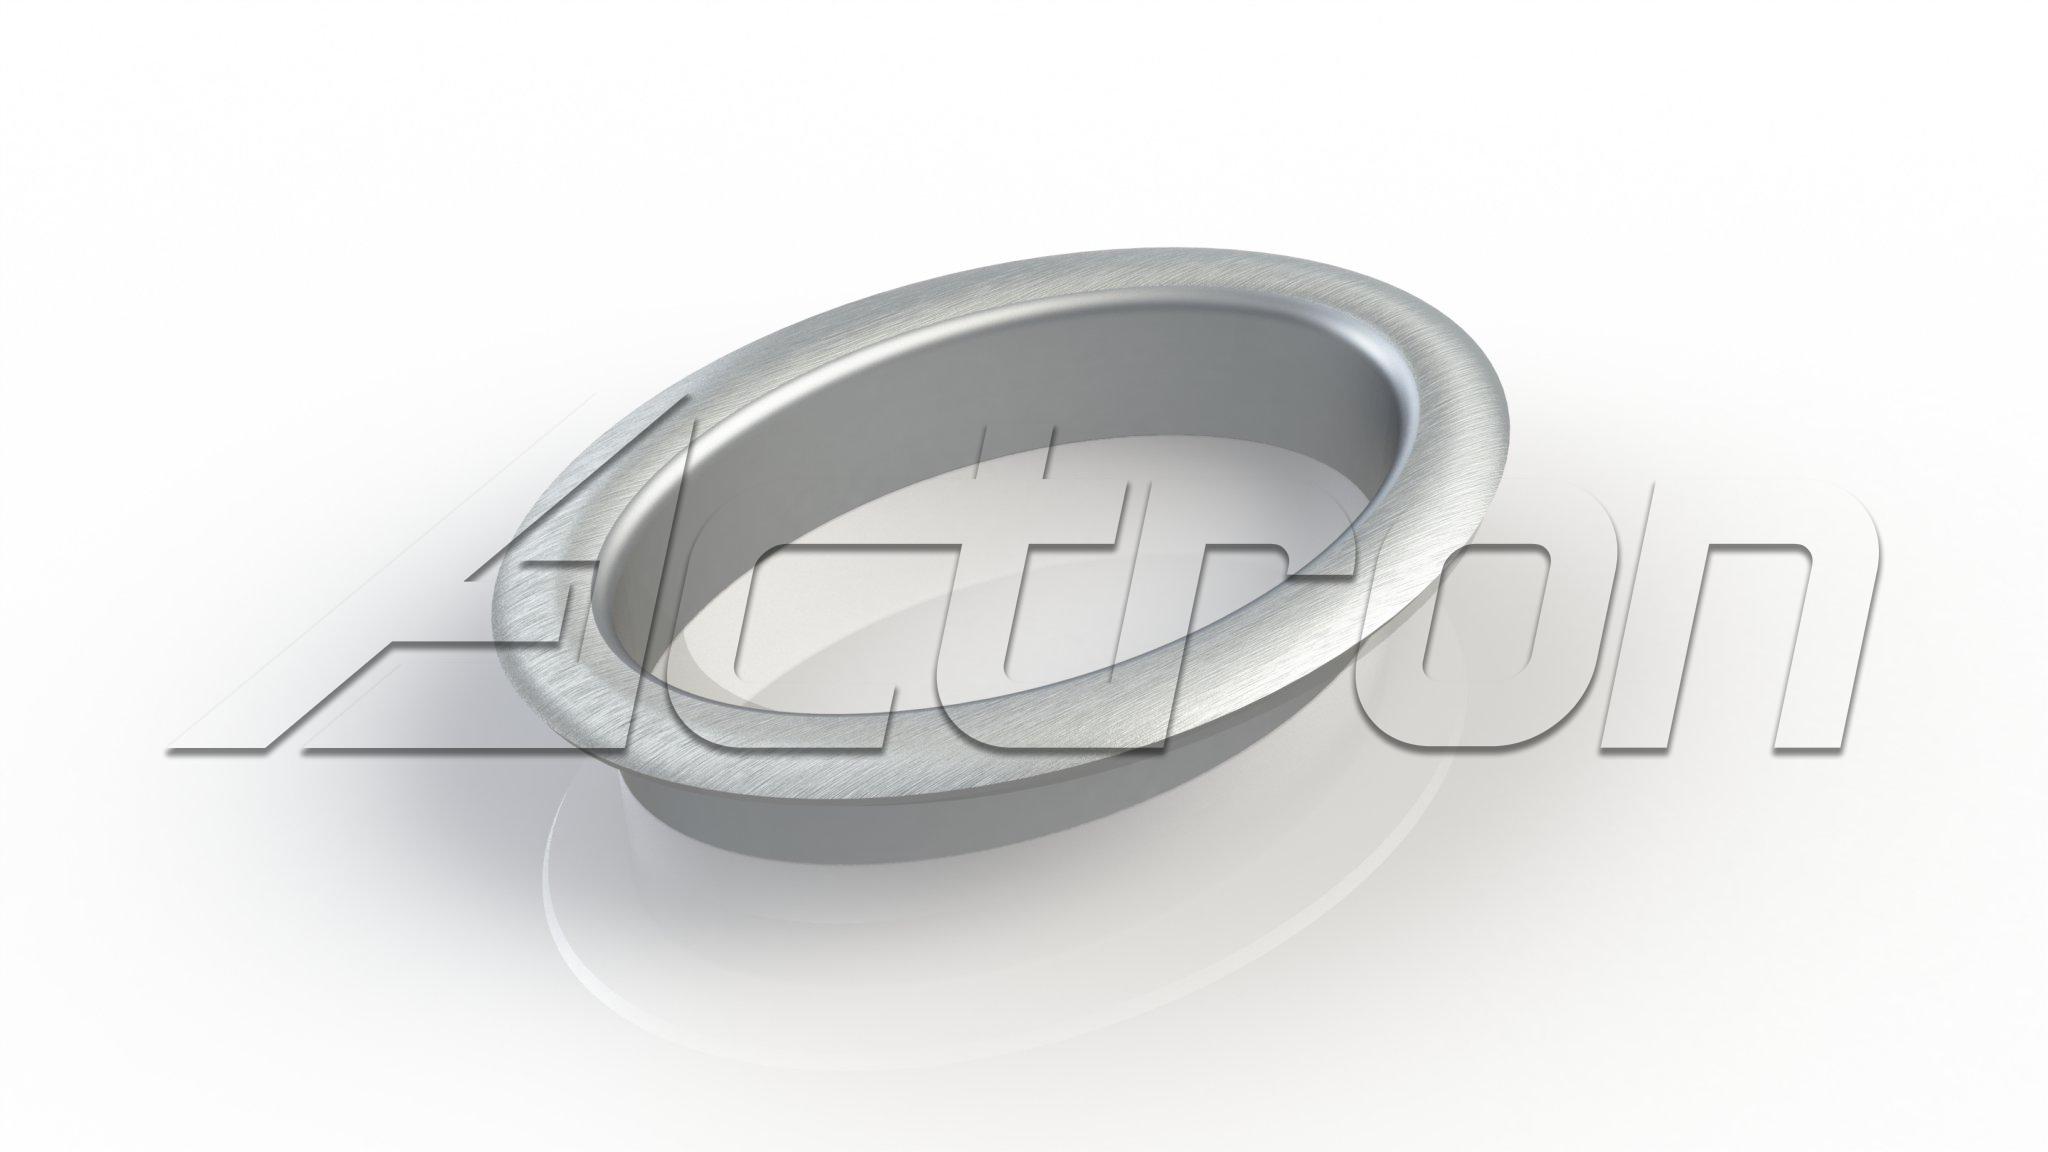 sleeve-8211-trim-5037-a43022.jpg